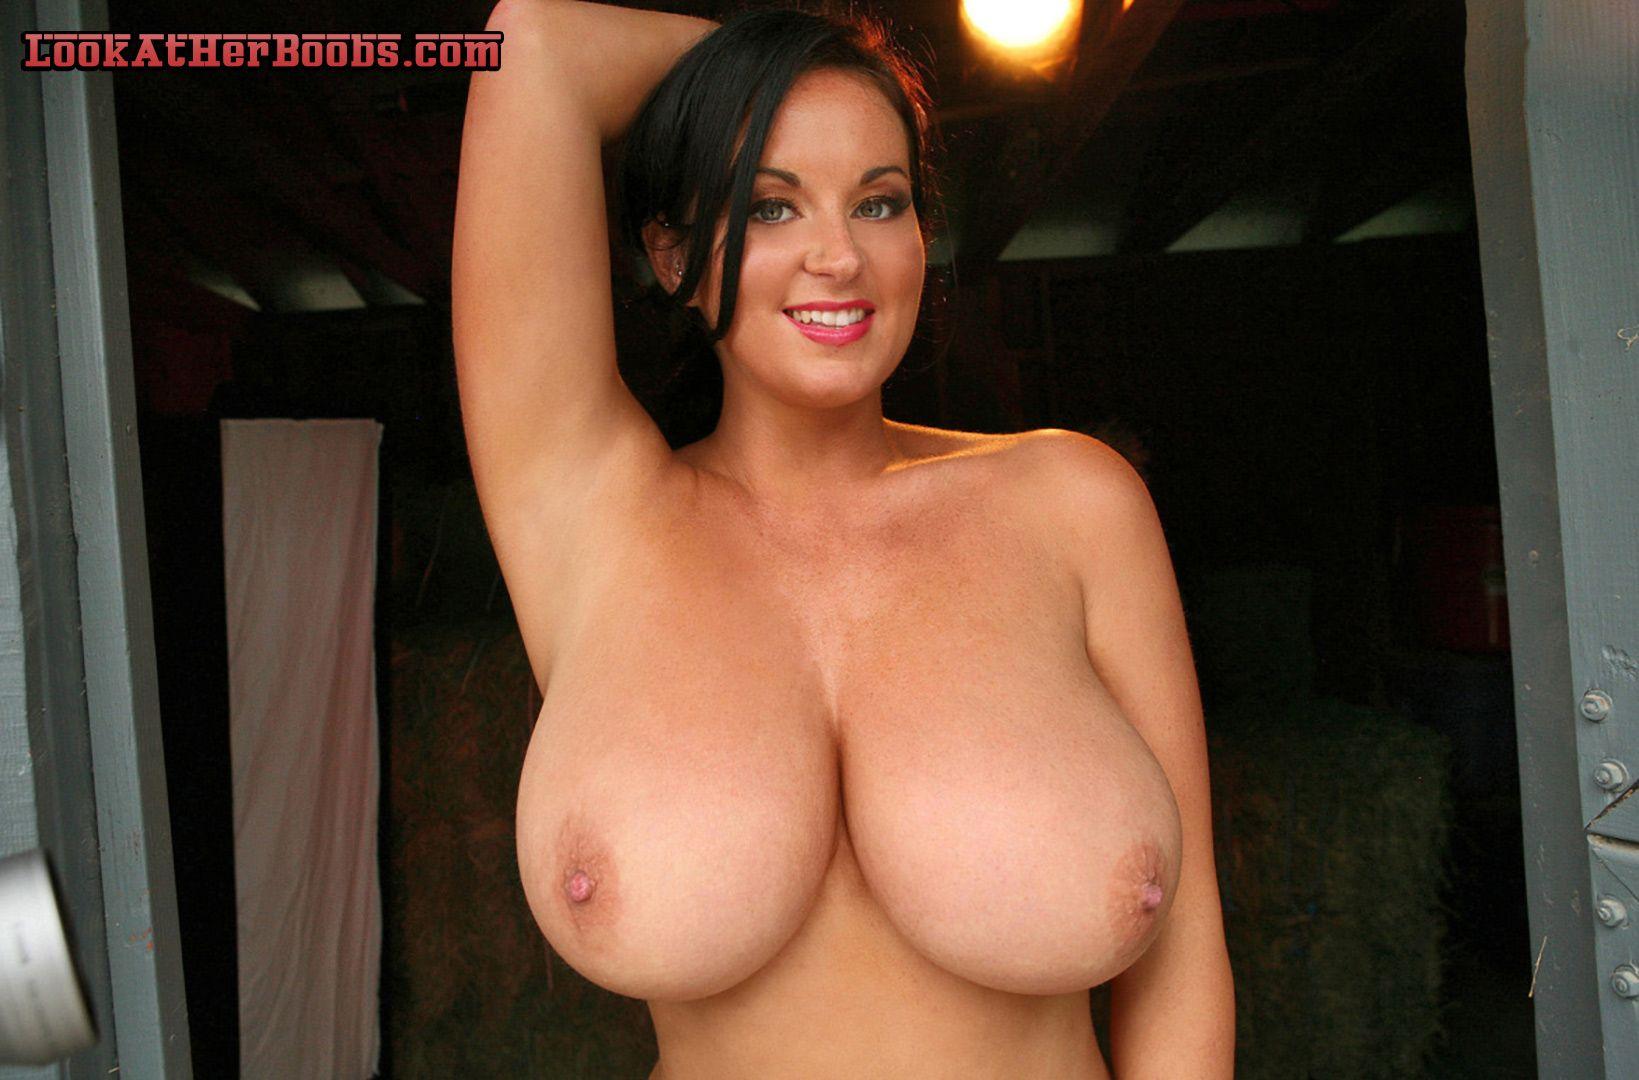 She love big cocks